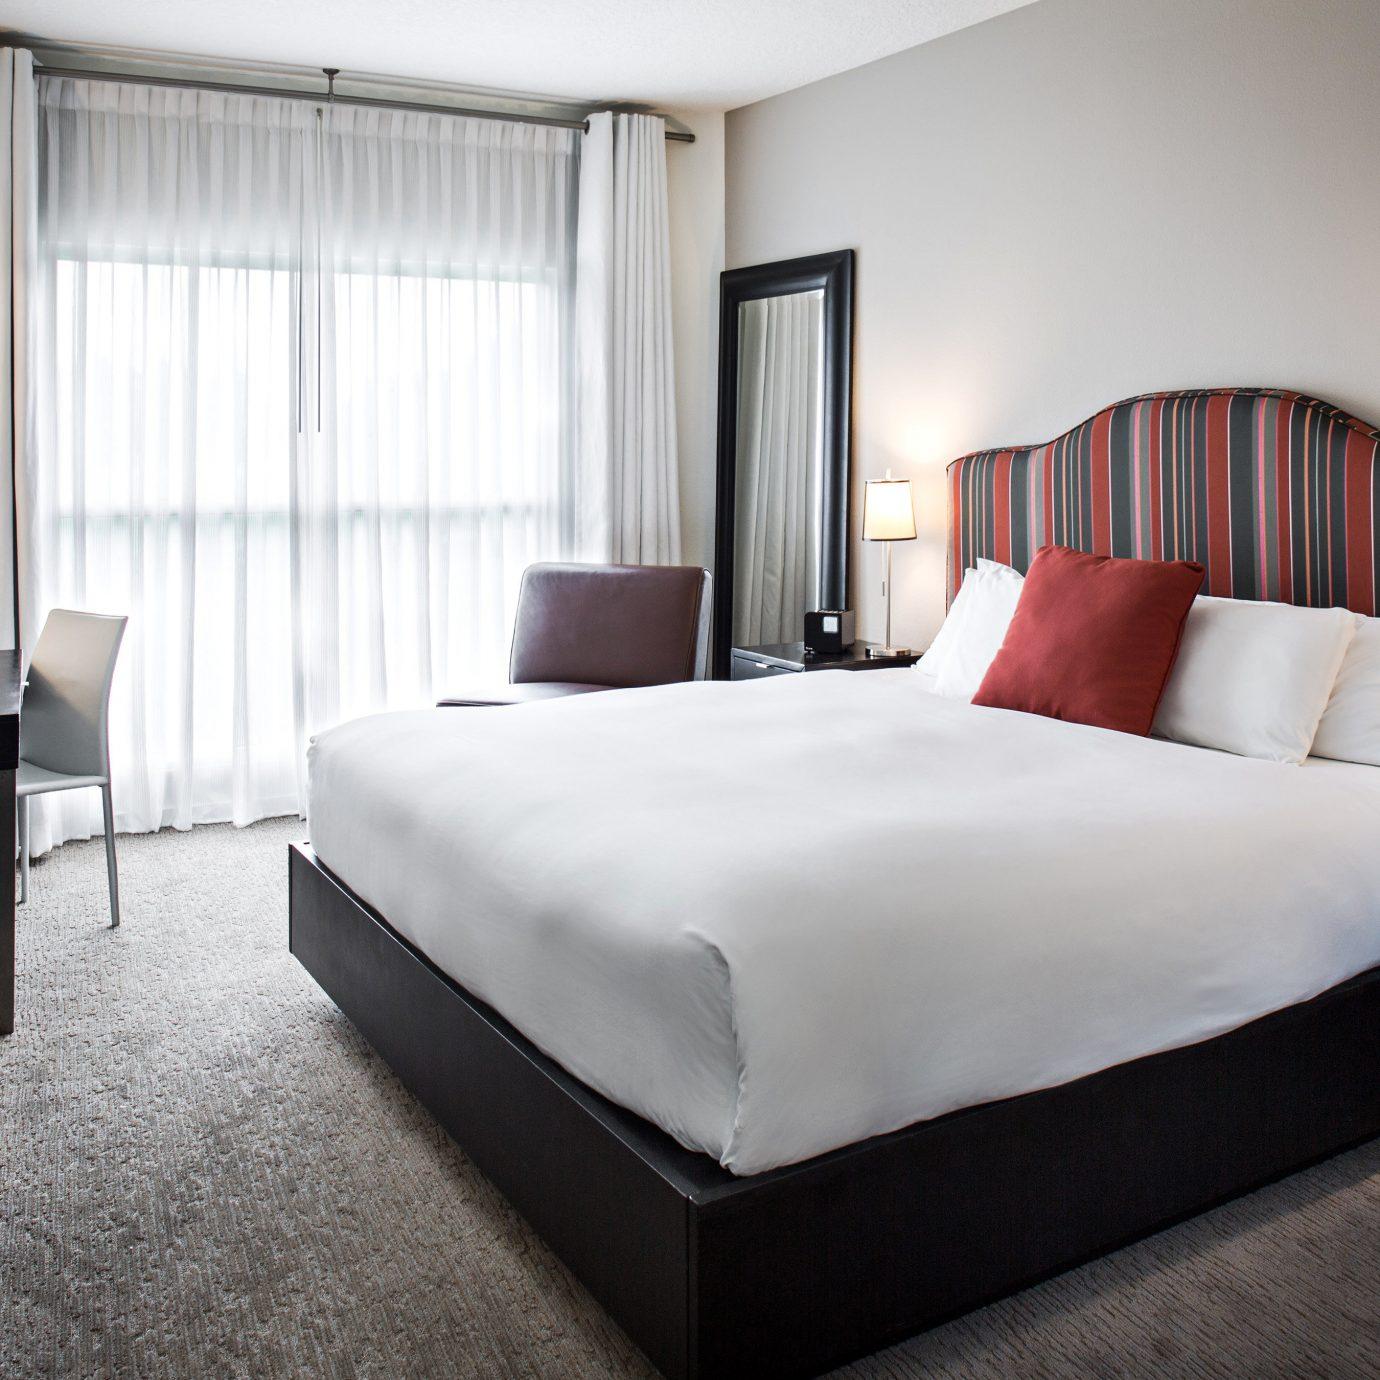 Bedroom Hip Luxury Suite sofa property living room condominium bed frame flat